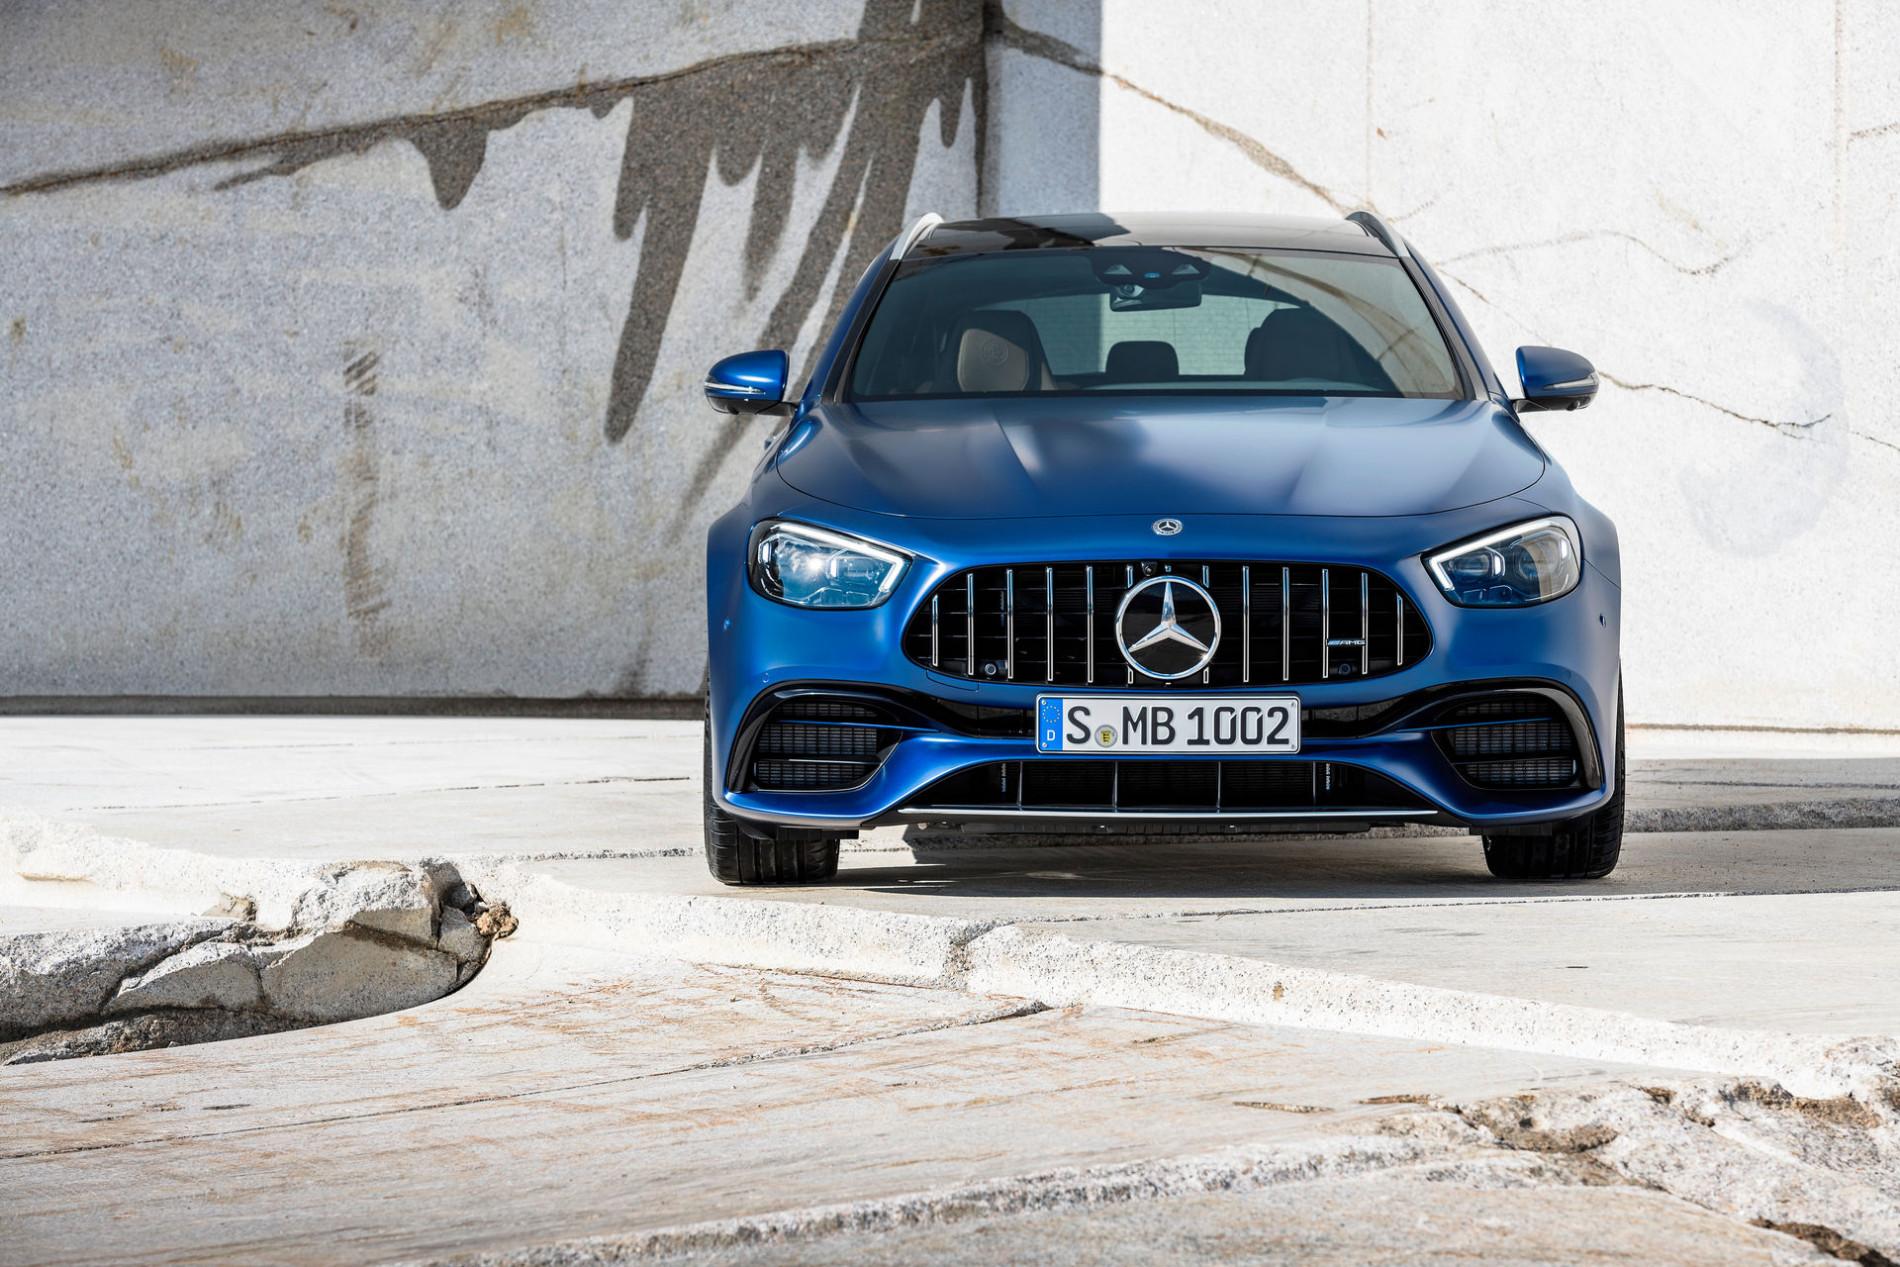 Mercedes E63 AMG Facelift - Mercedes E63 AMG Facelift